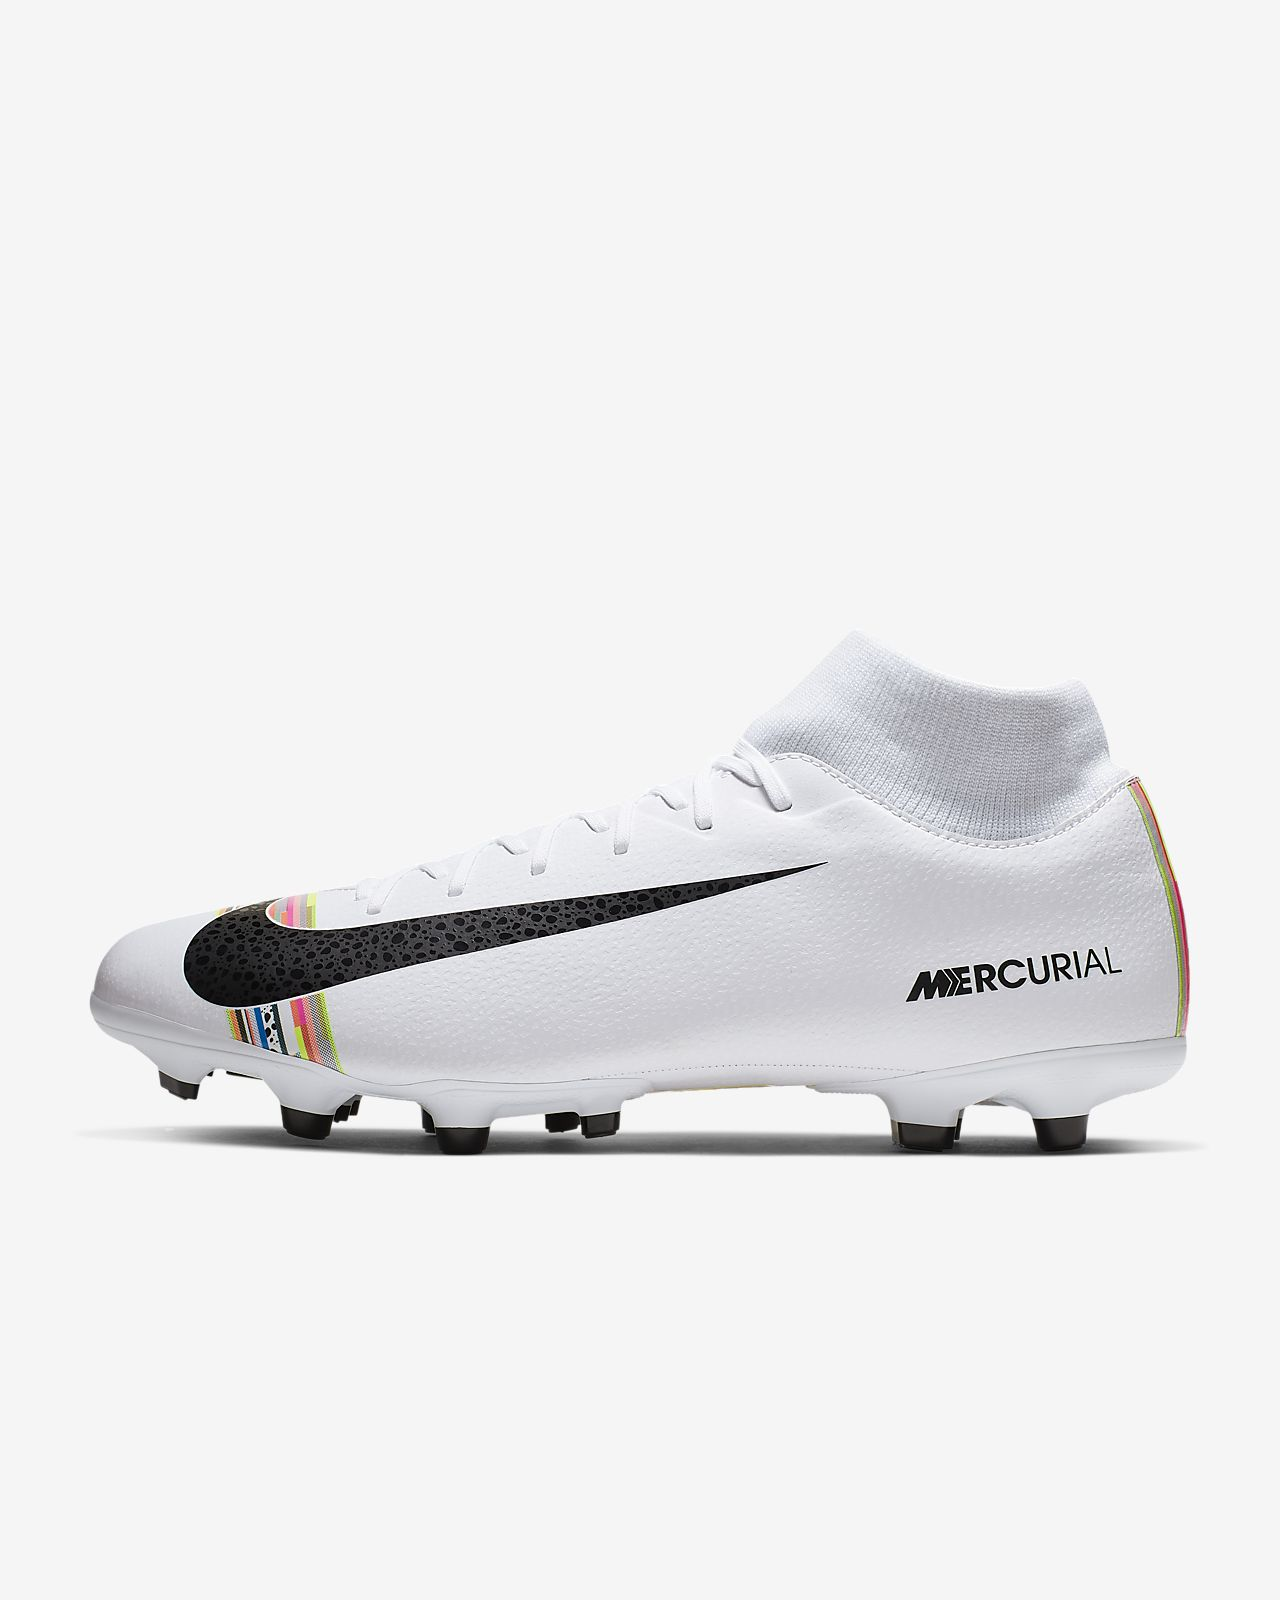 7ad1e839 ... Calzado de fútbol para múltiples superficies Nike Mercurial Superfly 6  Academy LVL UP MG